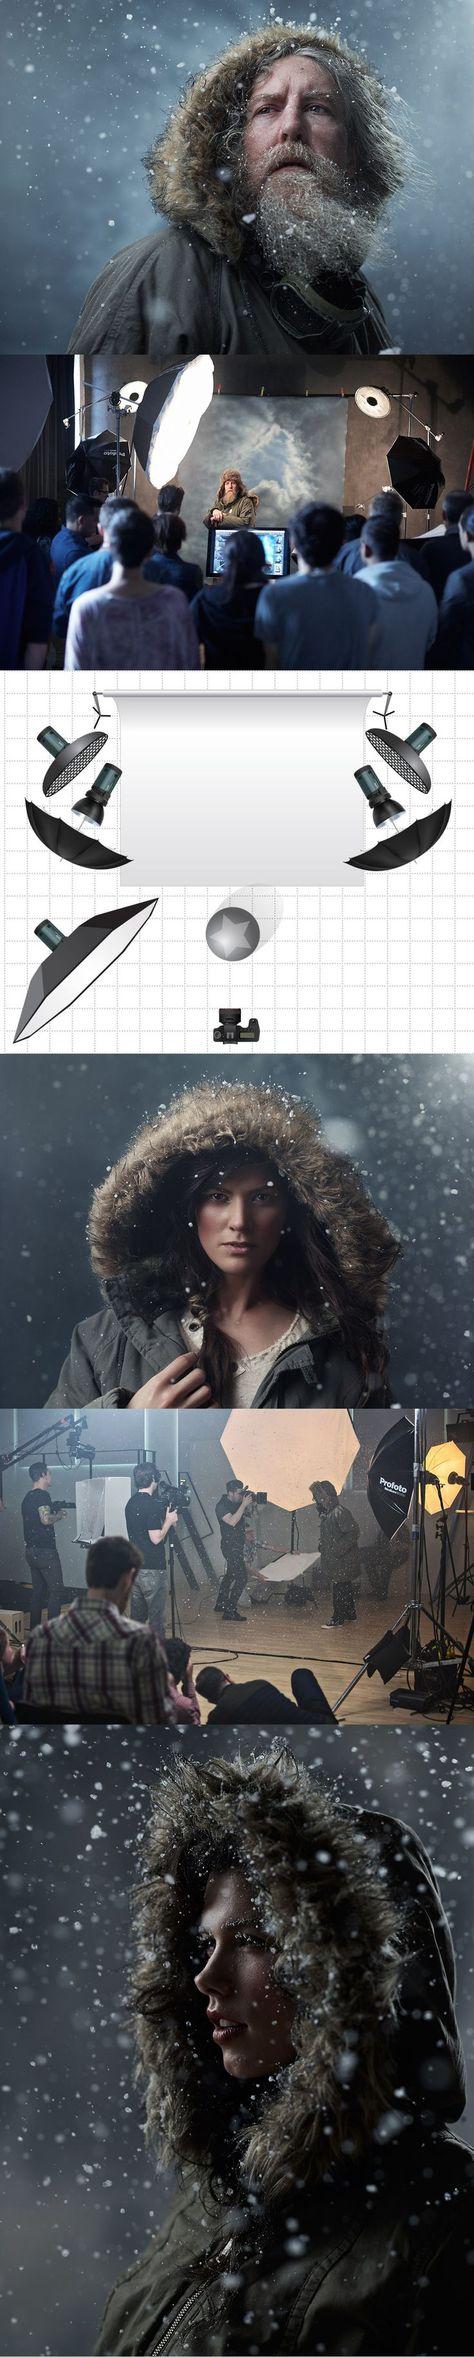 http://www.joeyl.com/blog/#!creating-an-indoor-blizzard: